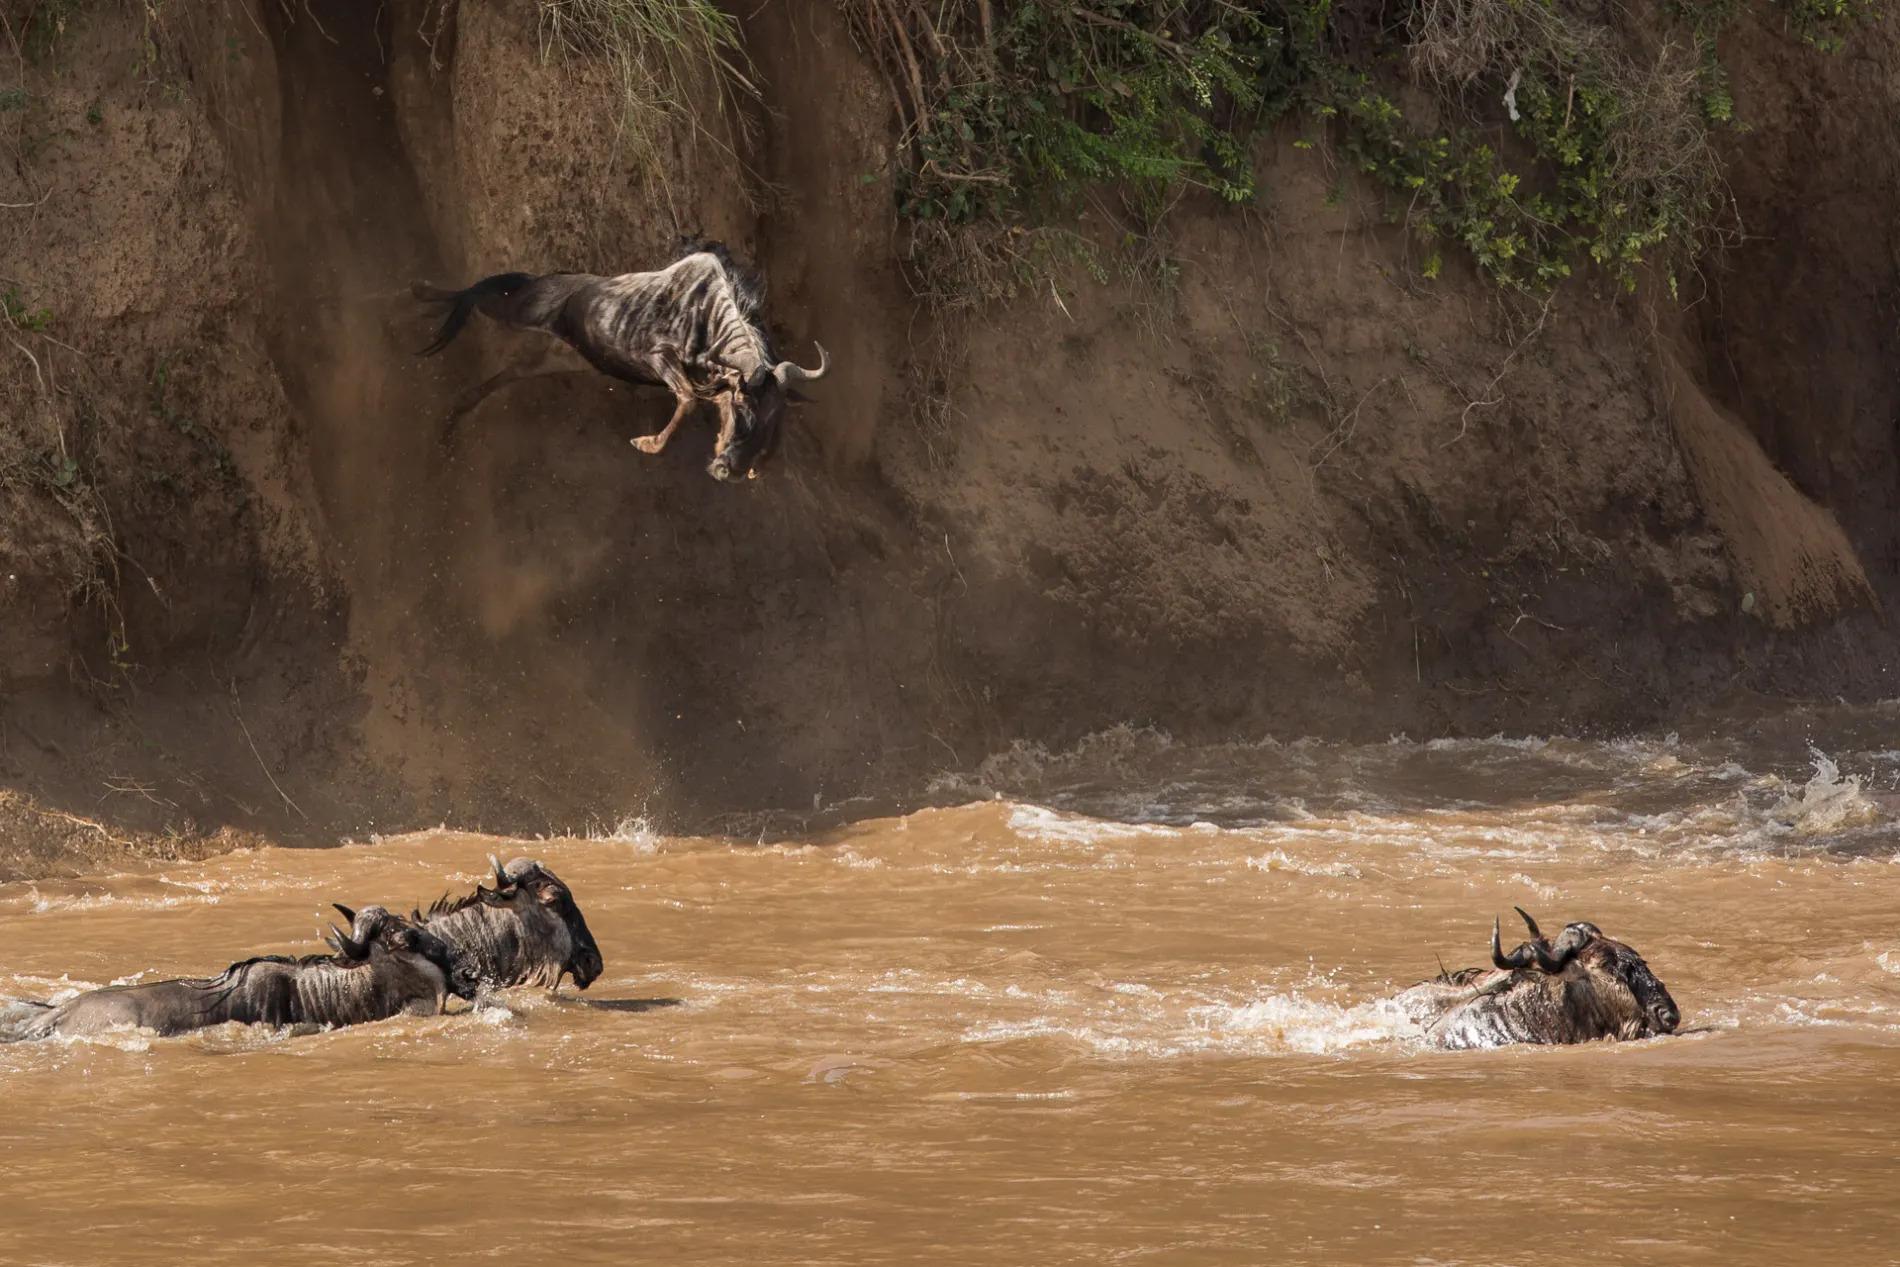 Mara river crossing 3